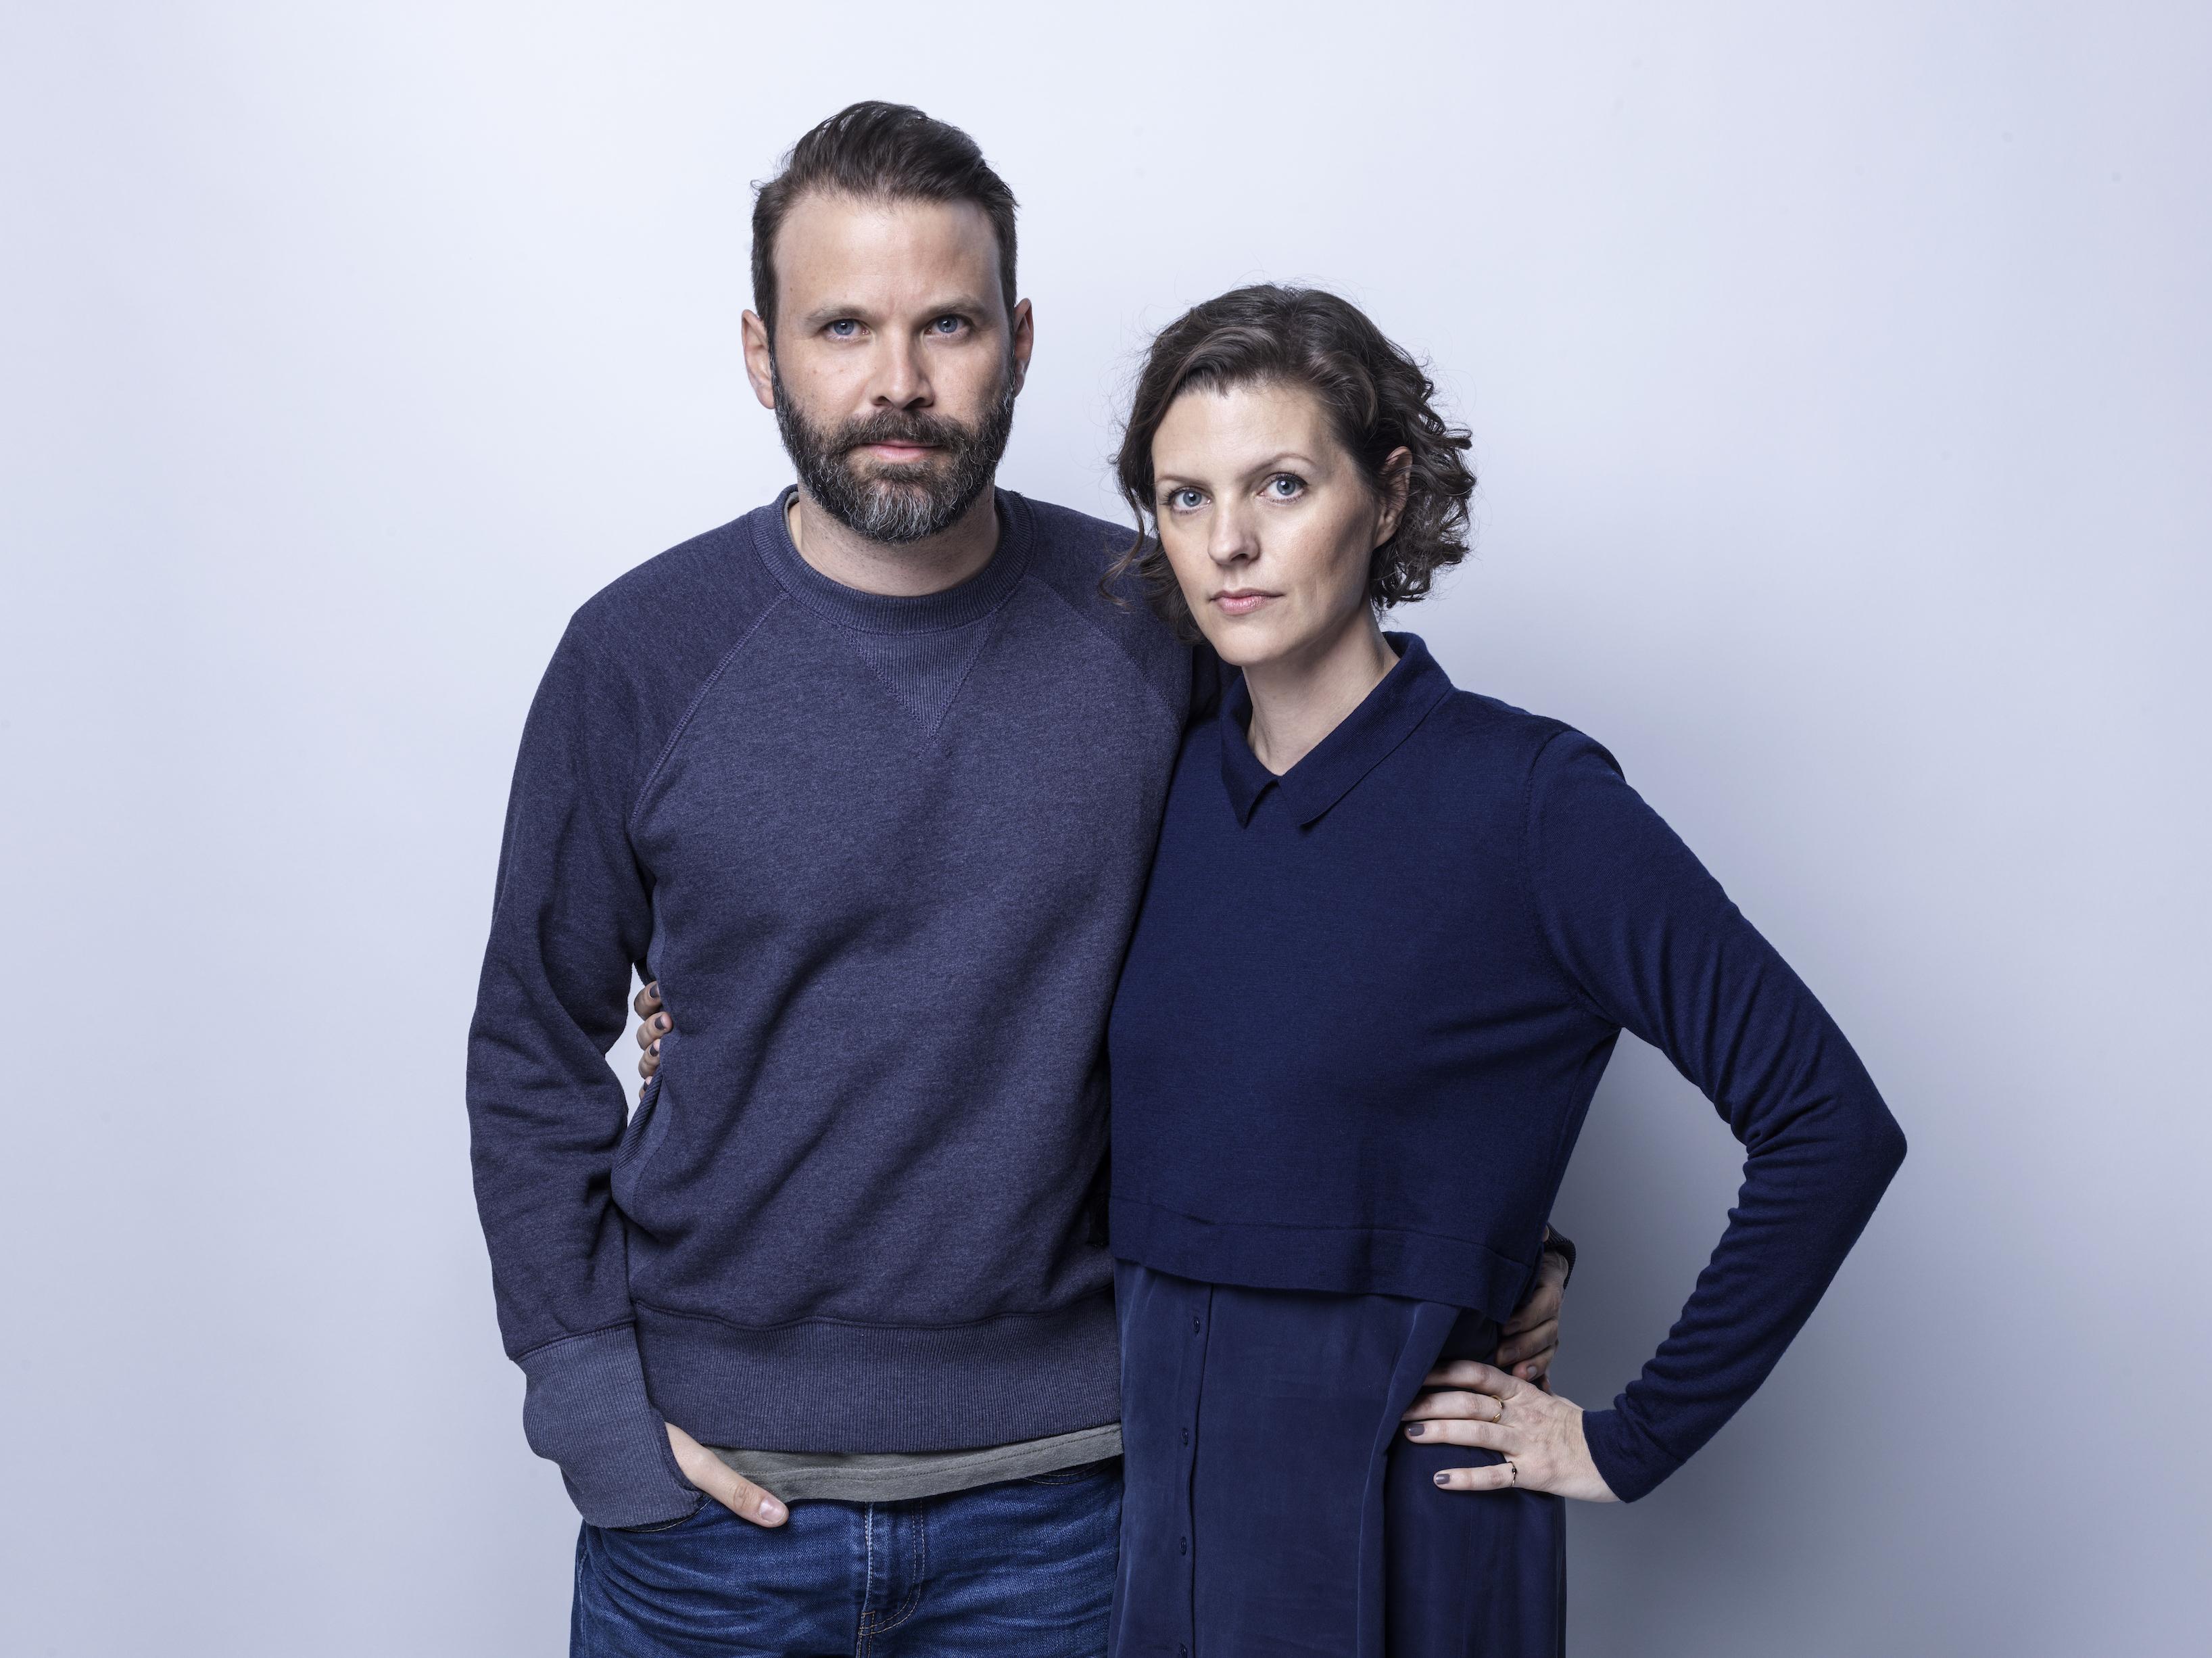 (L-R) Director, Baran bo Odar & Writer, Jantje Friese